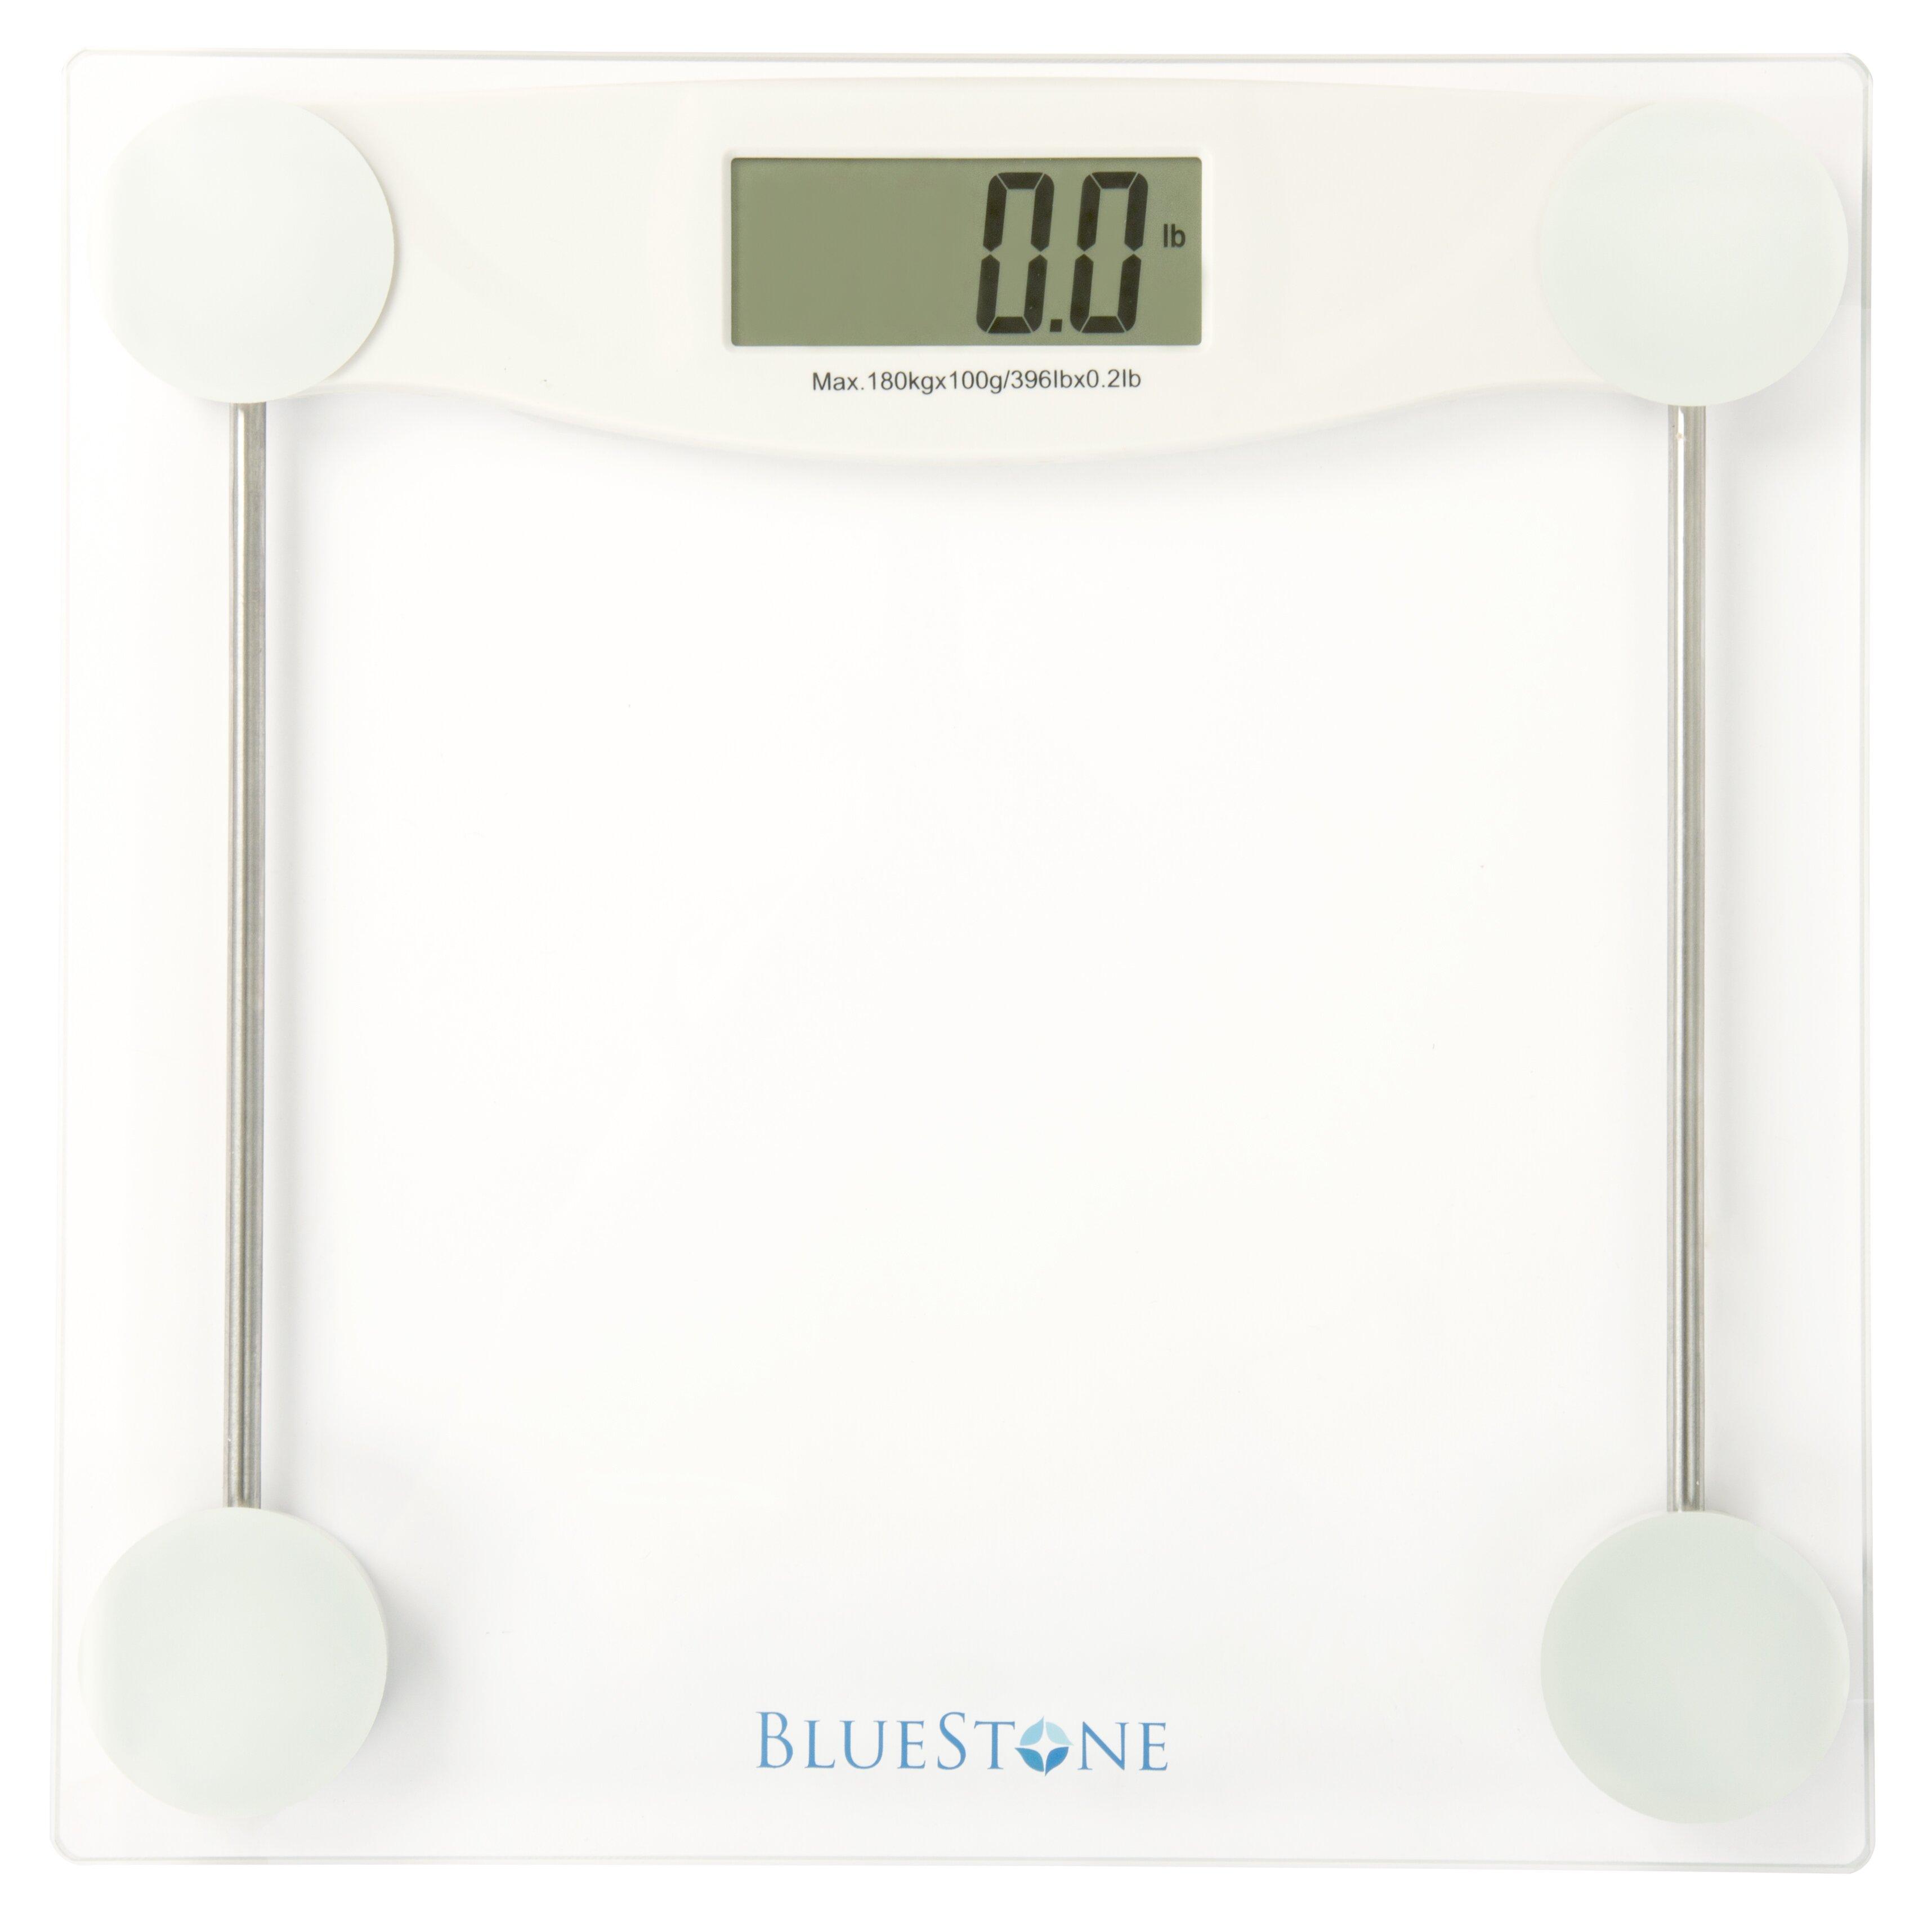 Bluestone Digital Glass Bathroom Scale With LCD Display Reviews Wayfair